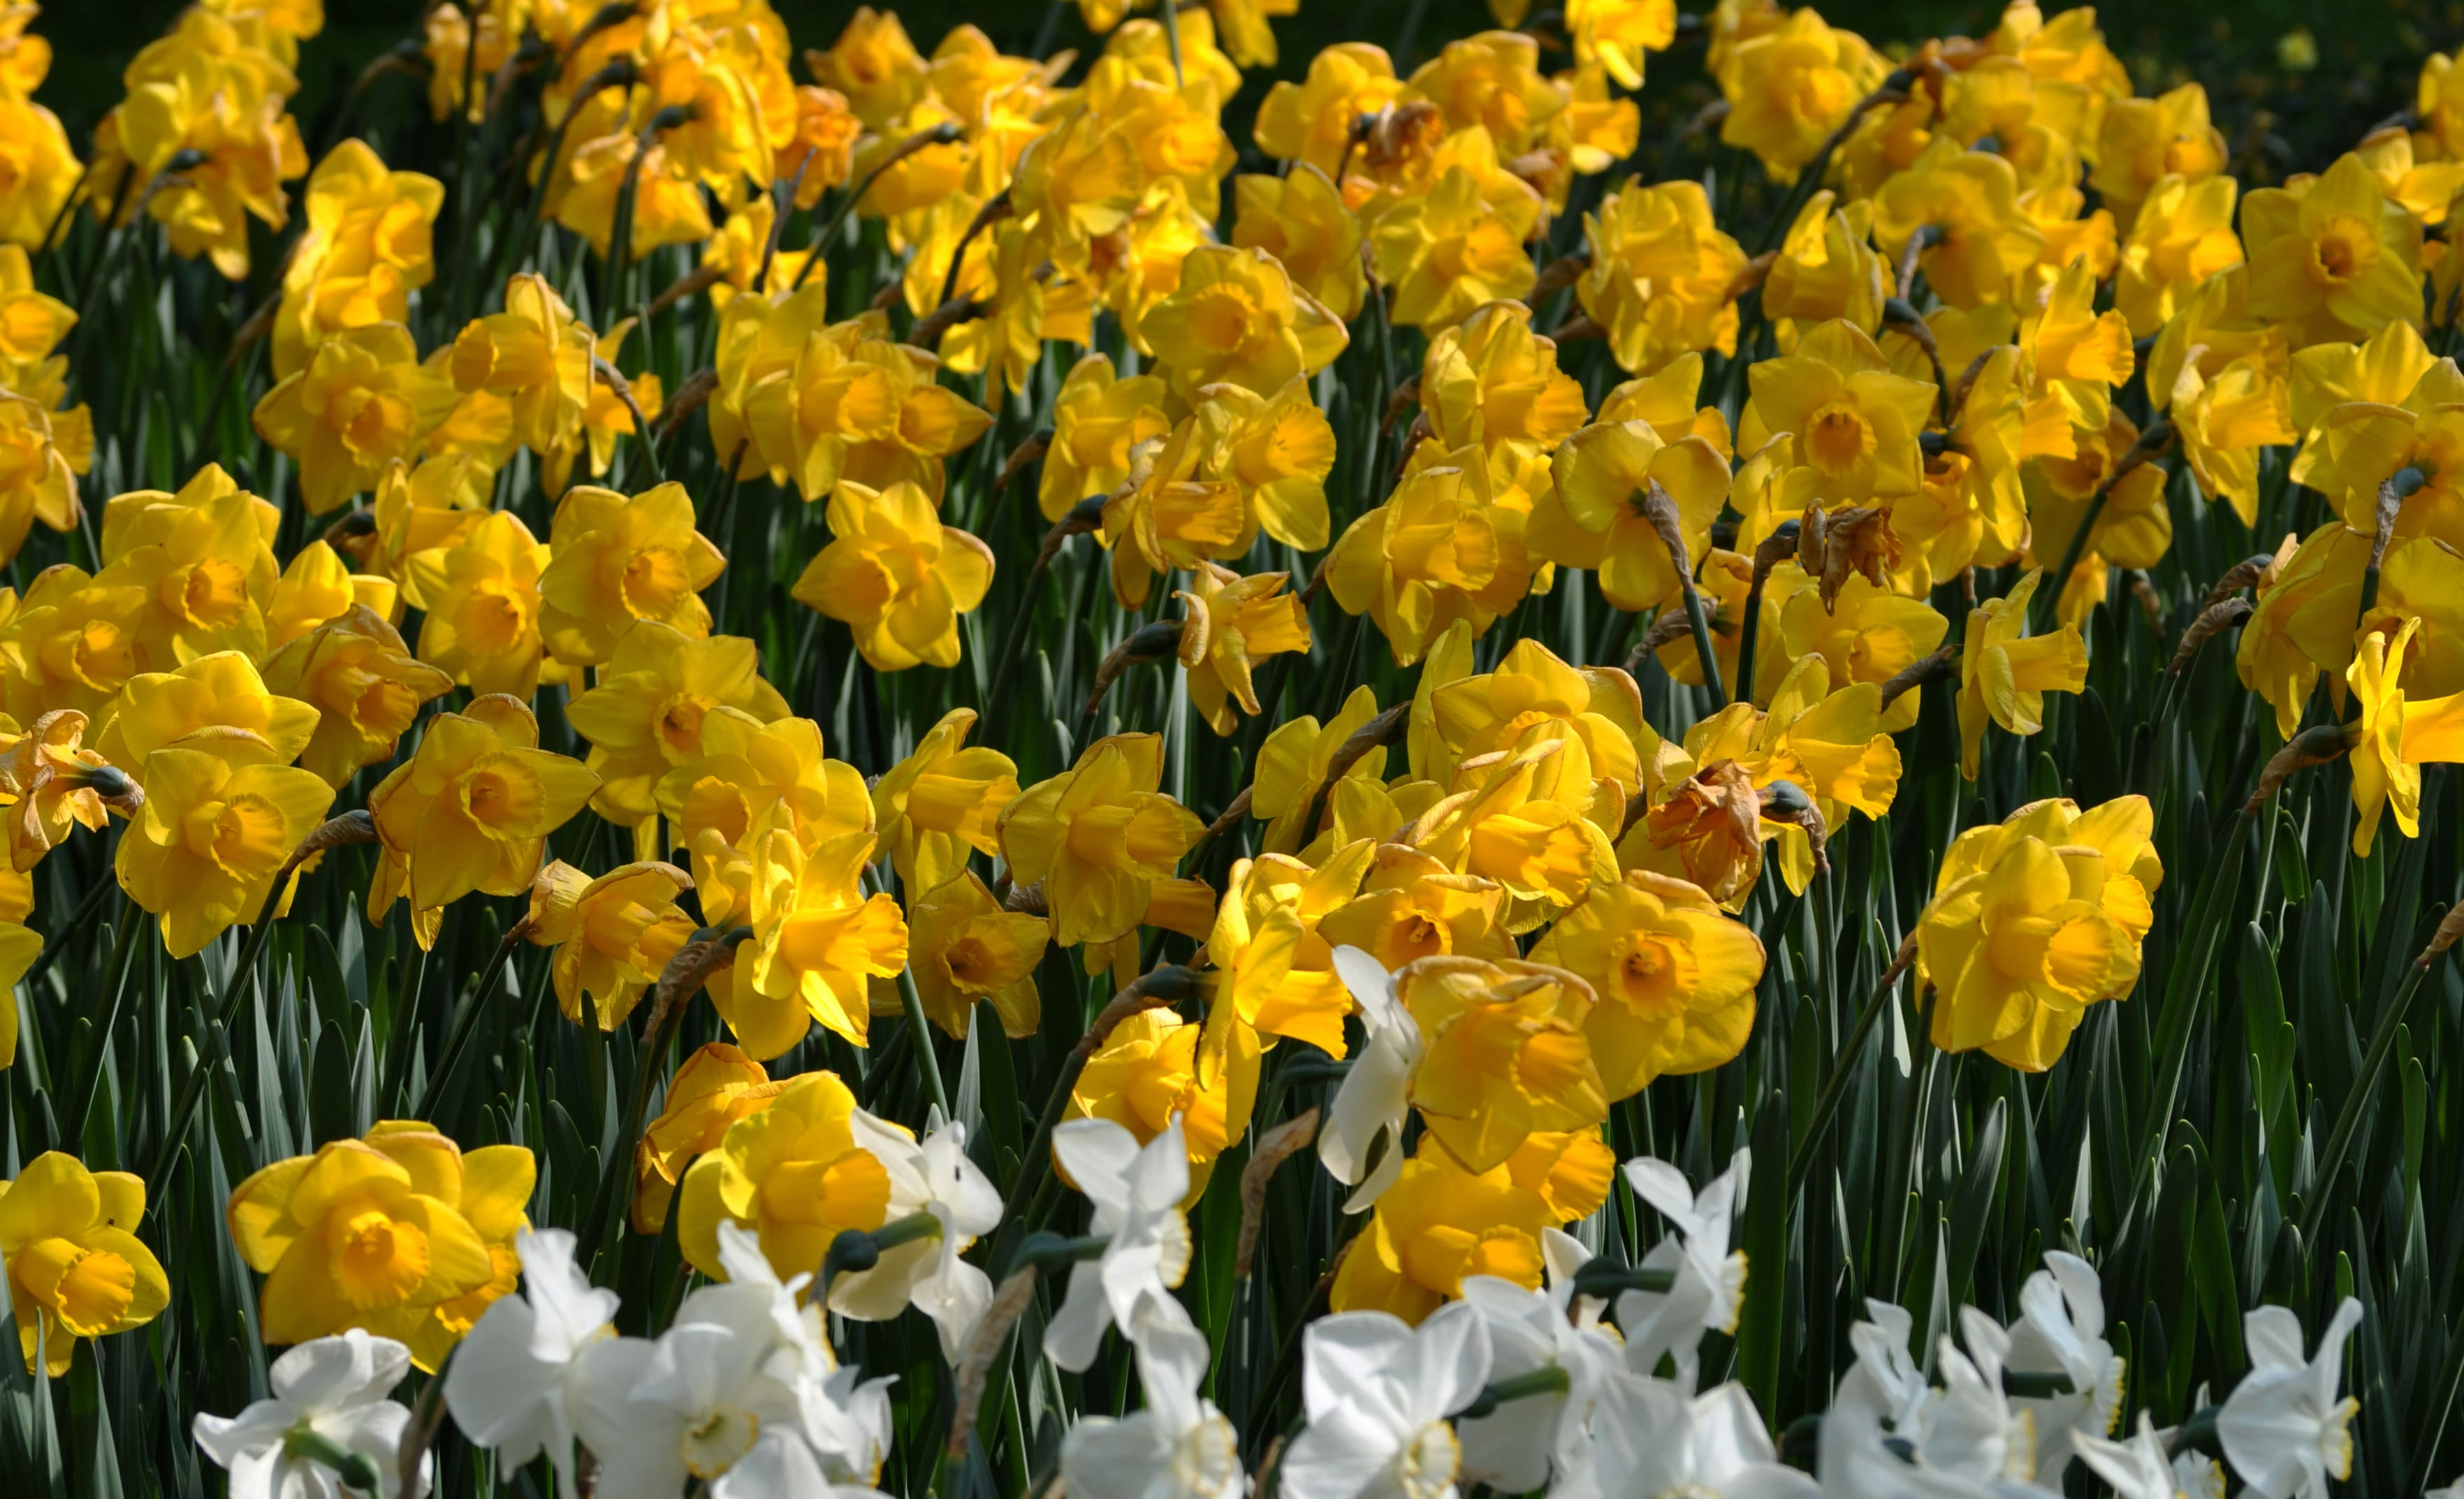 daffodils-photo-53